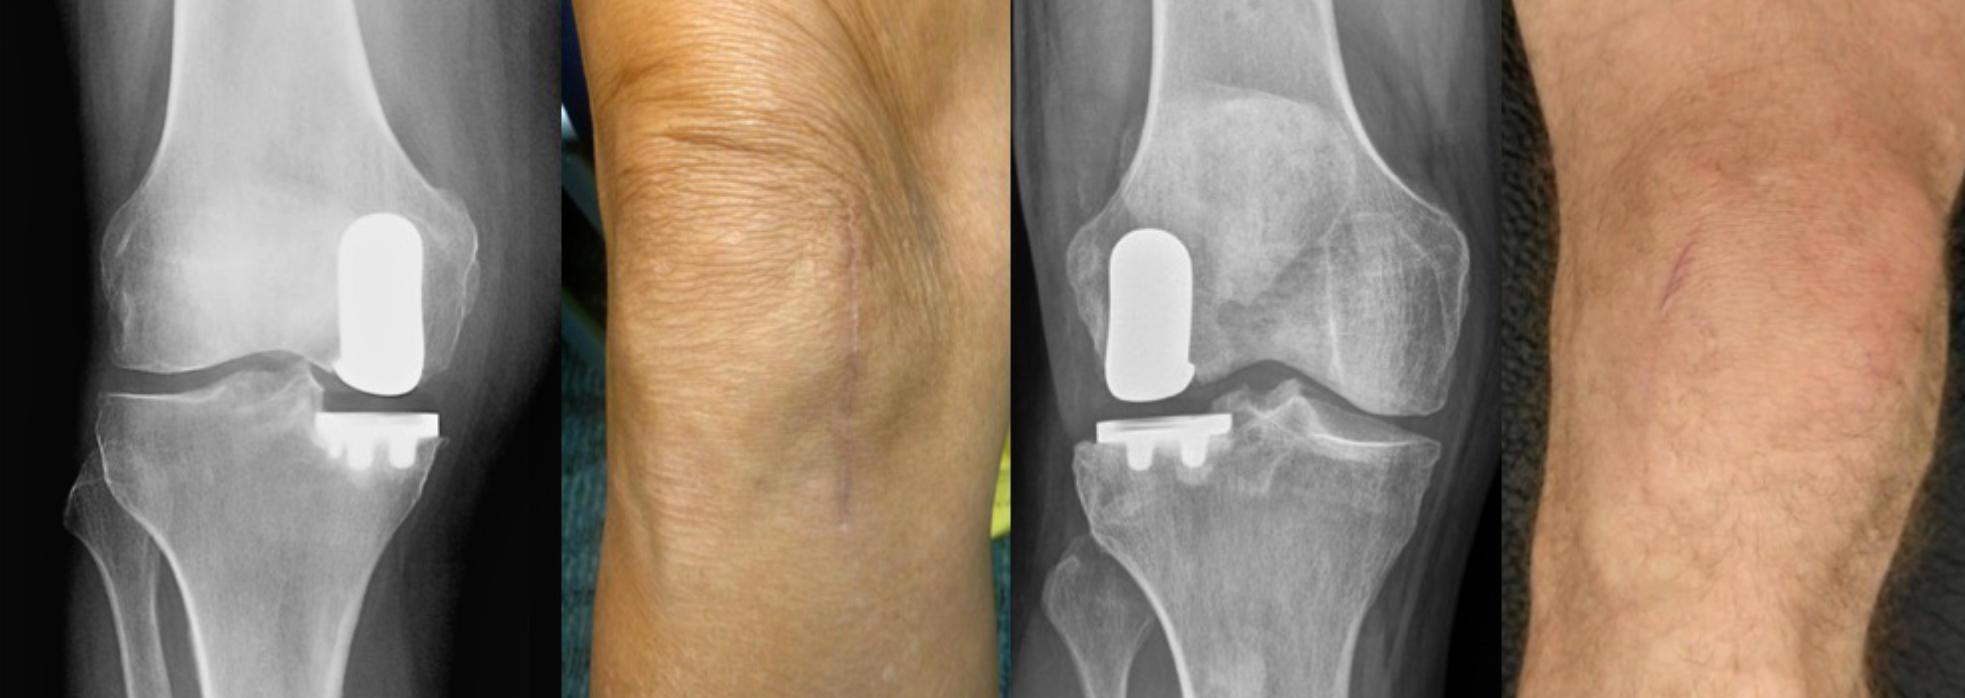 Patients' knees after Mako Robotic knee replacement surgery